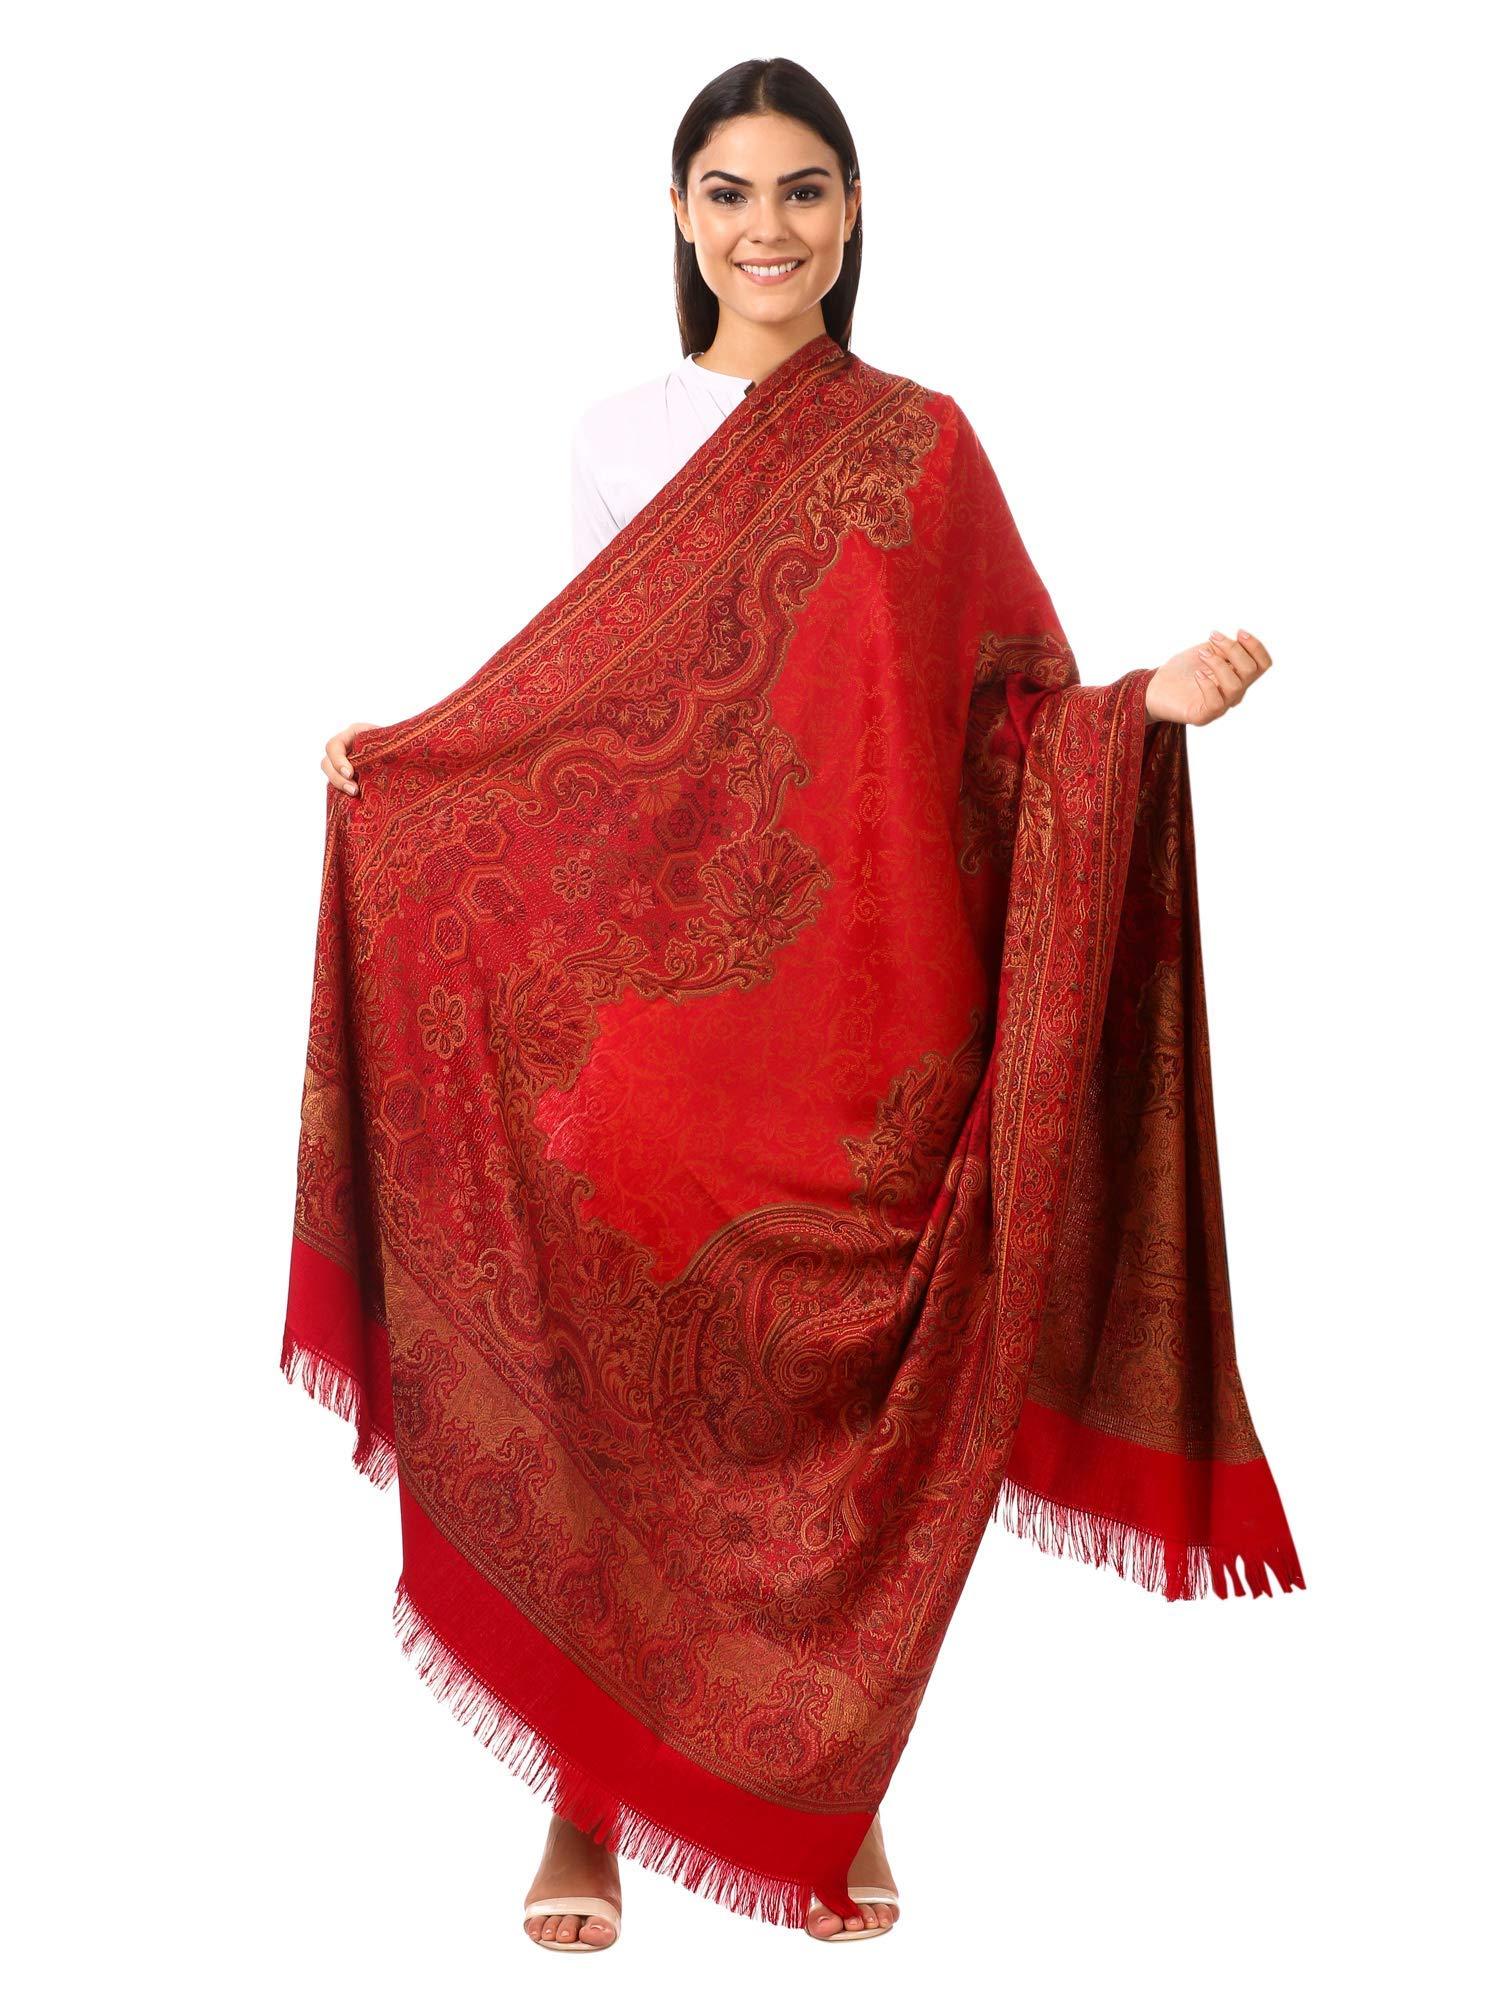 0a68334a80 Pashtush Women's Kashmiri Shawl, Jacquard palla, Warm ande soft ...